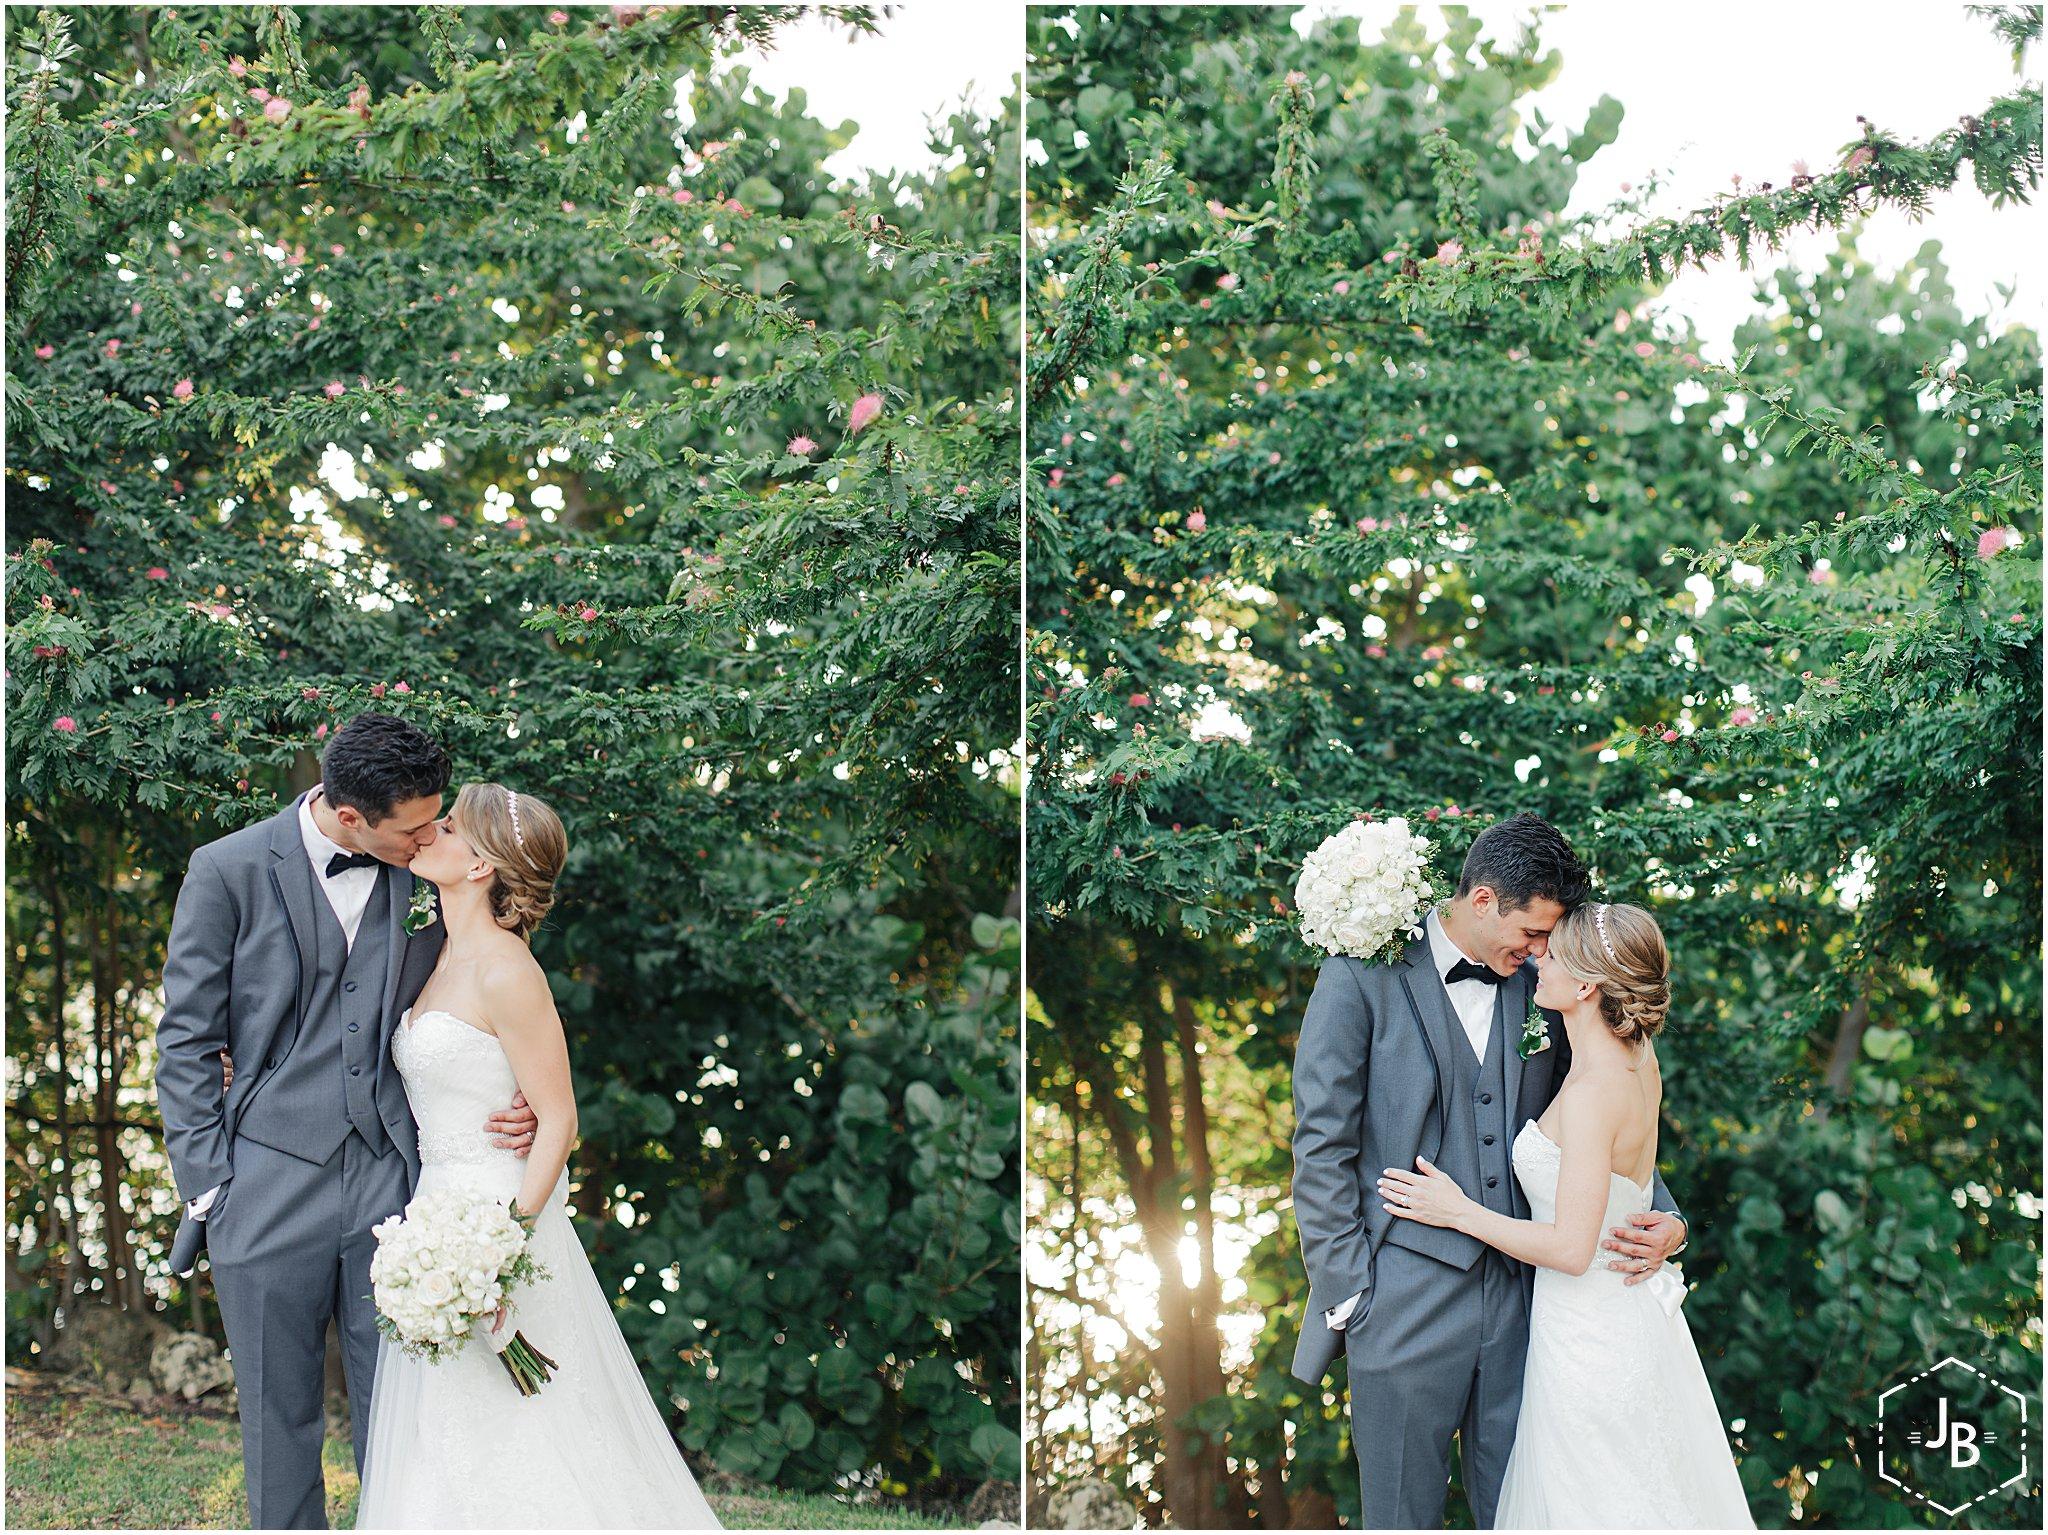 WeddingandEngagementFloridaPhotographer_0361.jpg